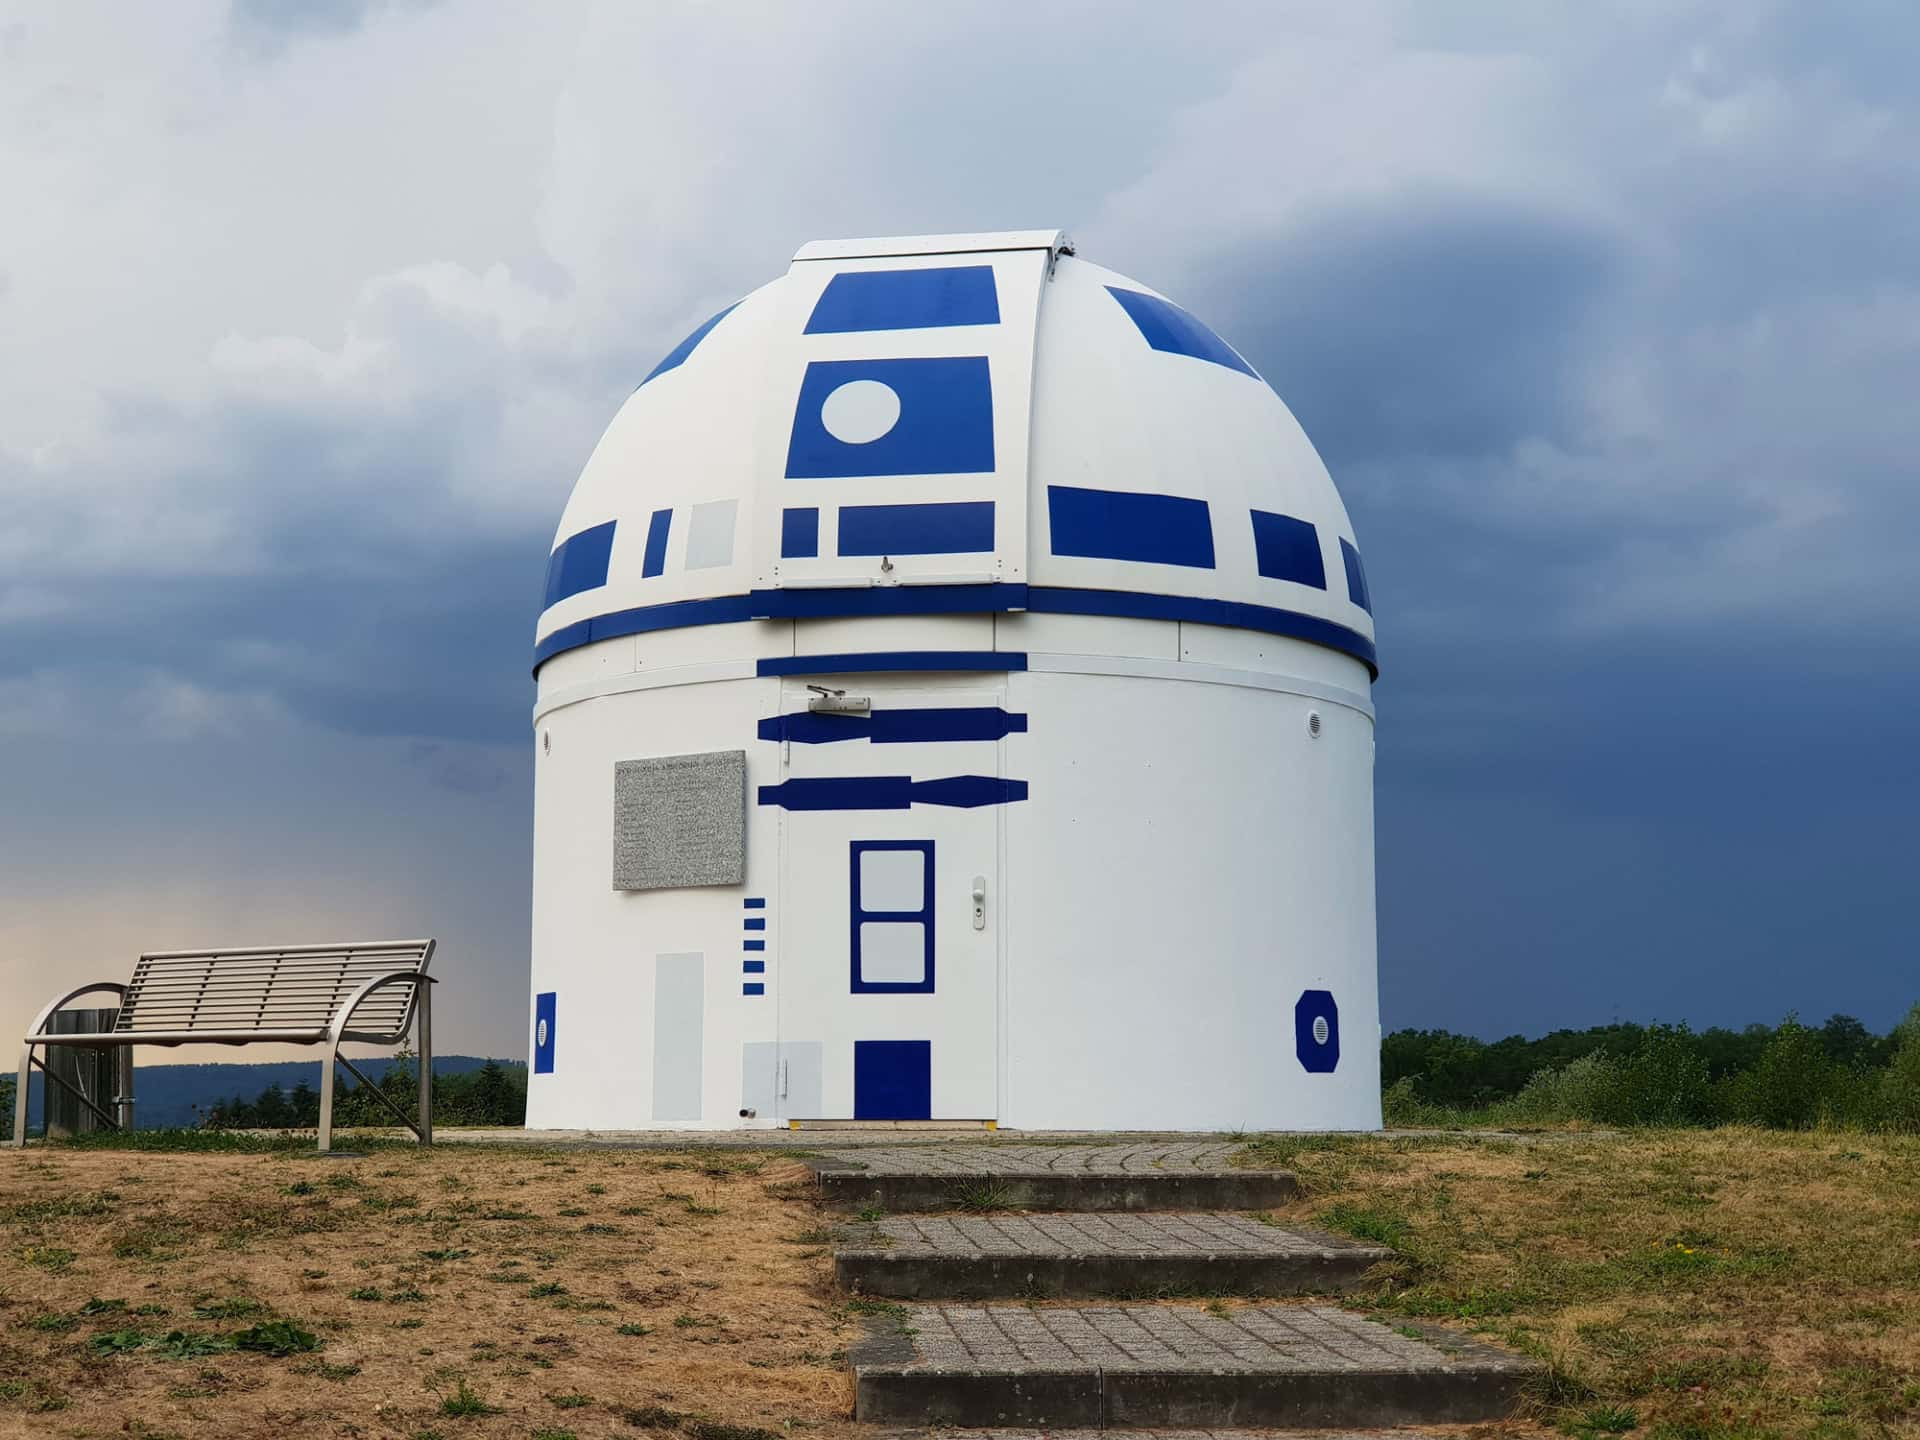 Fachada del observatorio de observatorio de Zweibrücken en alemania pintado de r2d2